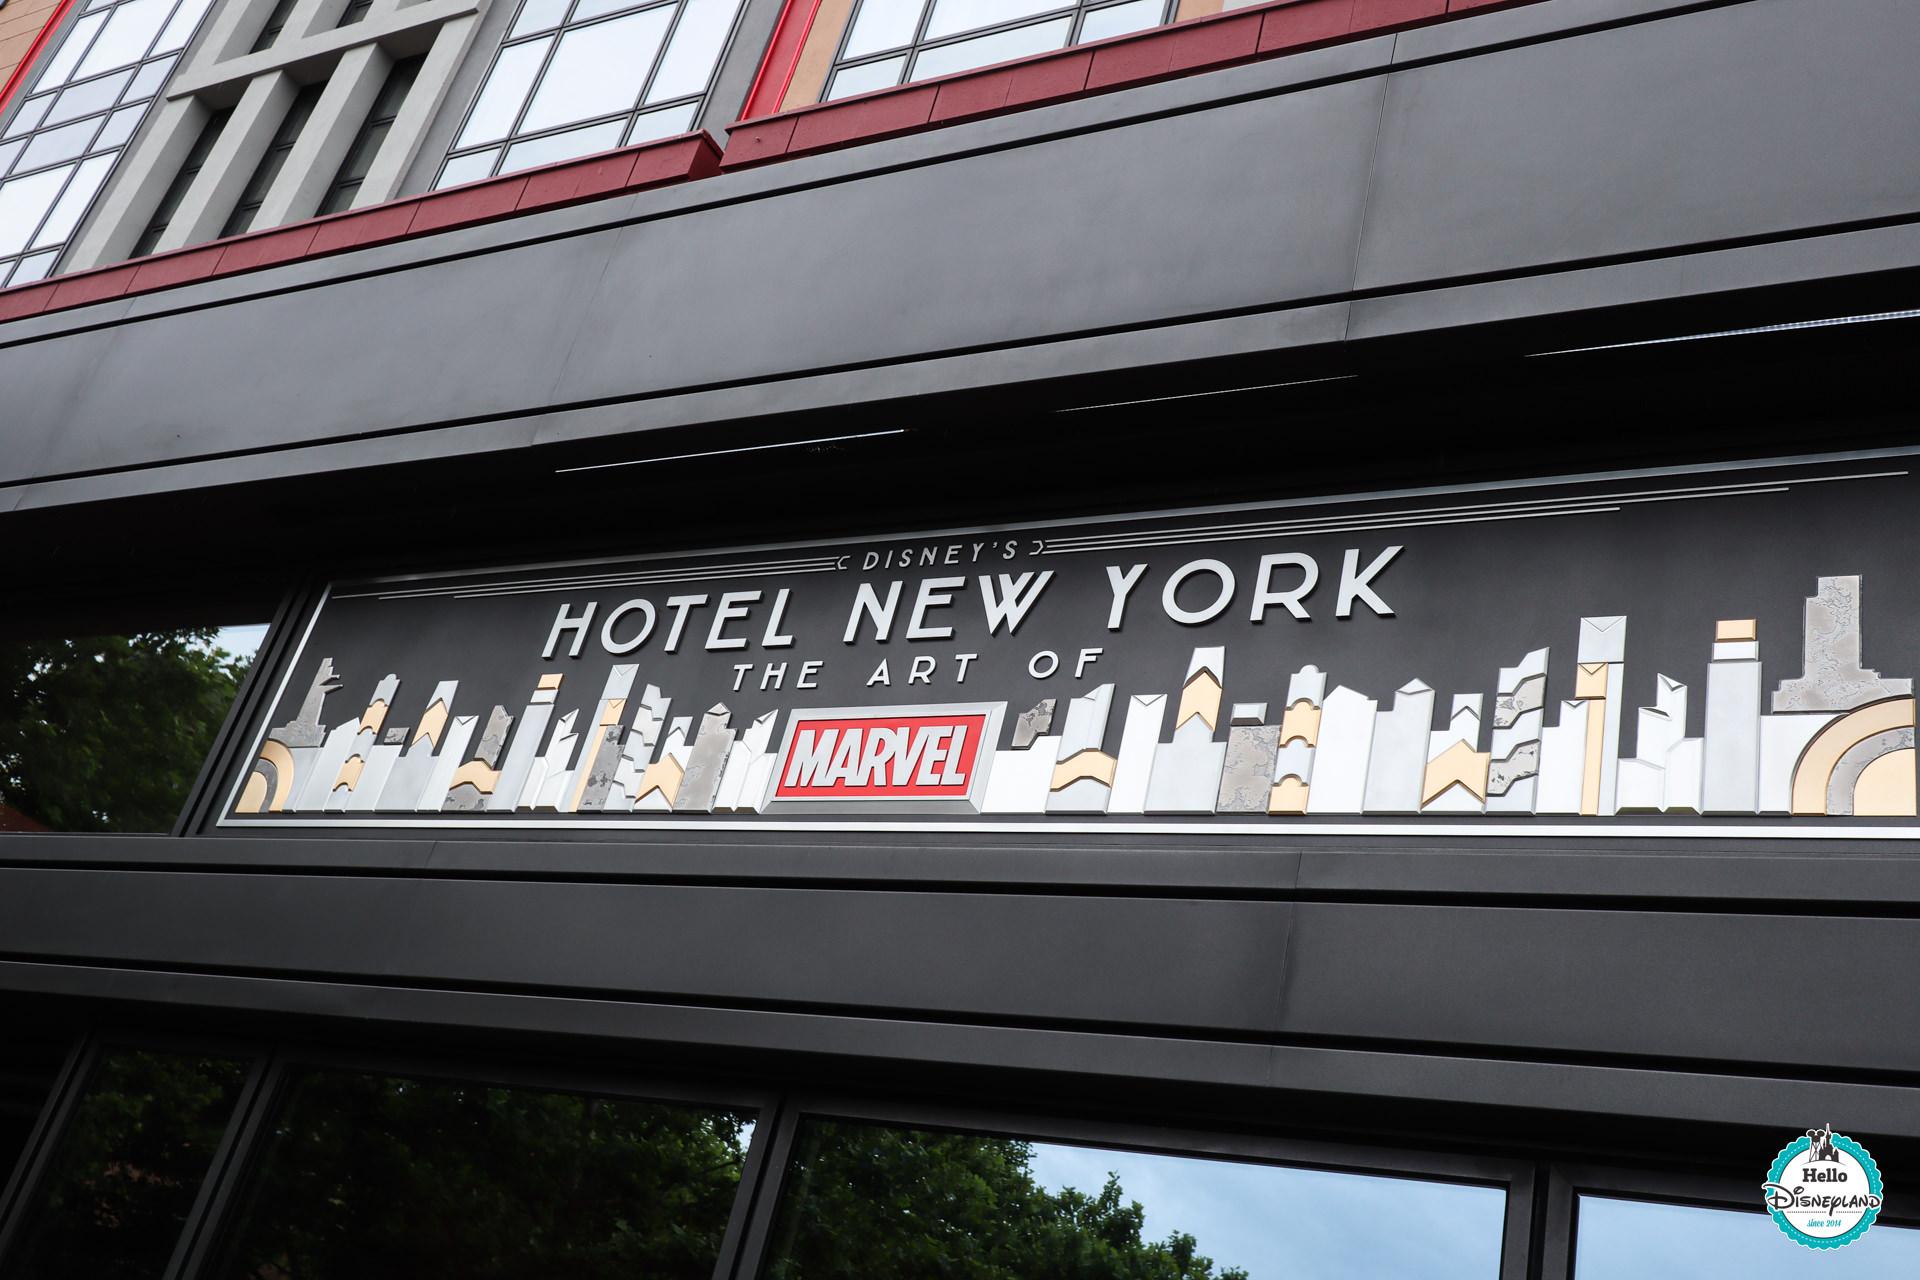 Disney Hotel New York - The Art of Marvel-432